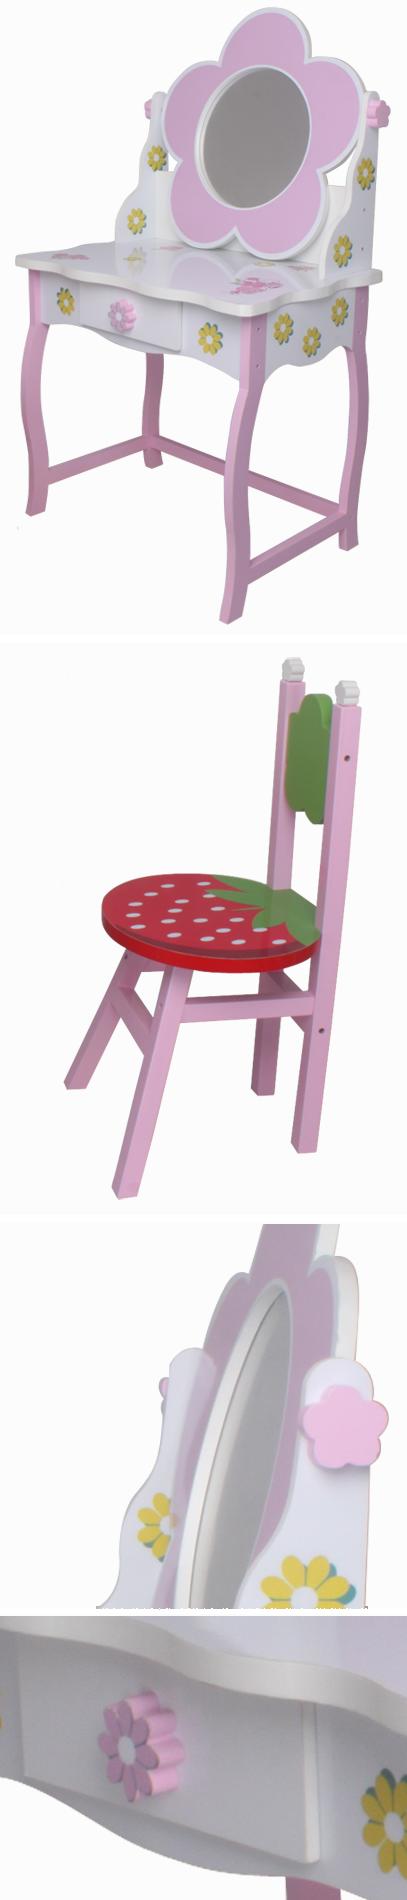 kinder schminktisch 264 blumen rosa gr n wei rot spiegel. Black Bedroom Furniture Sets. Home Design Ideas